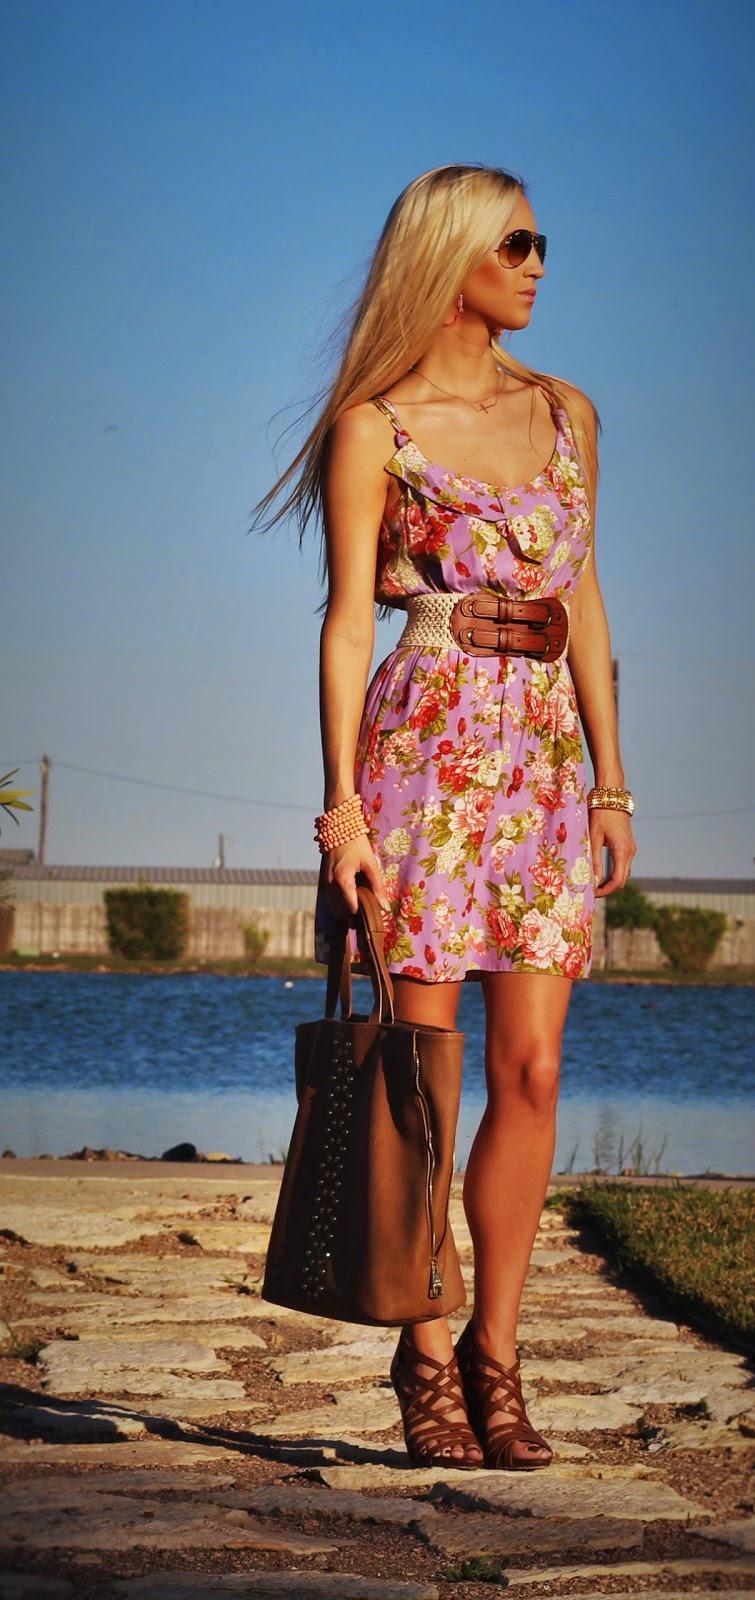 http://www.fabphilosophy.blogspot.com/2014/04/outfit-of-day-feeling-flirty-in.html